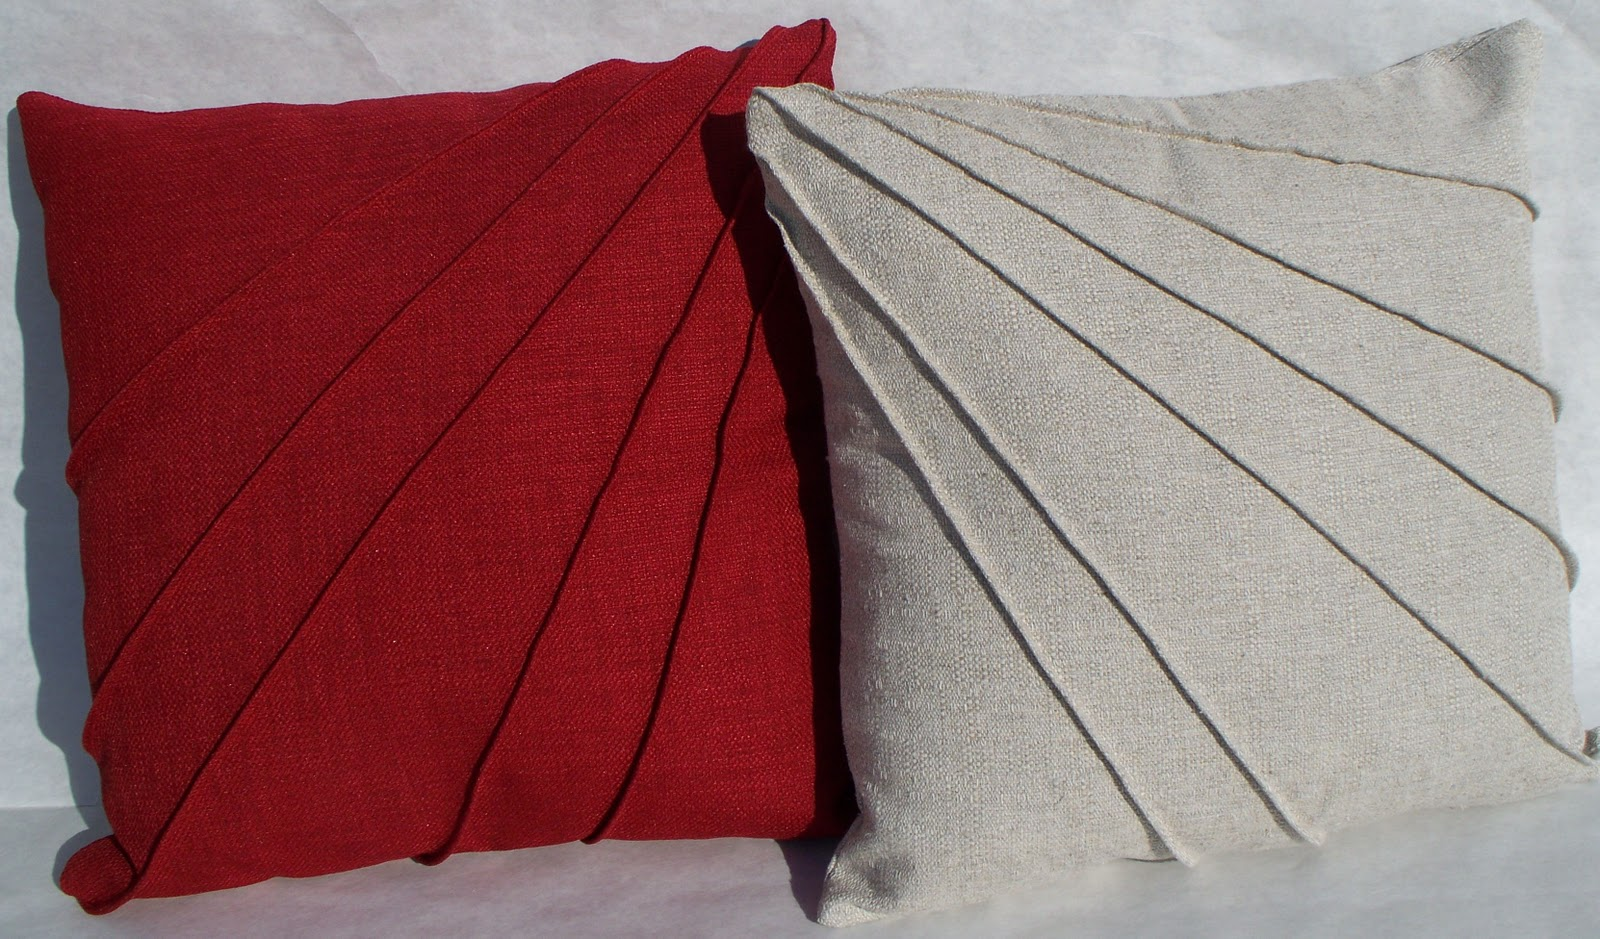 Krista Sew Inspired Star Burst Pintuck Pillow Cover